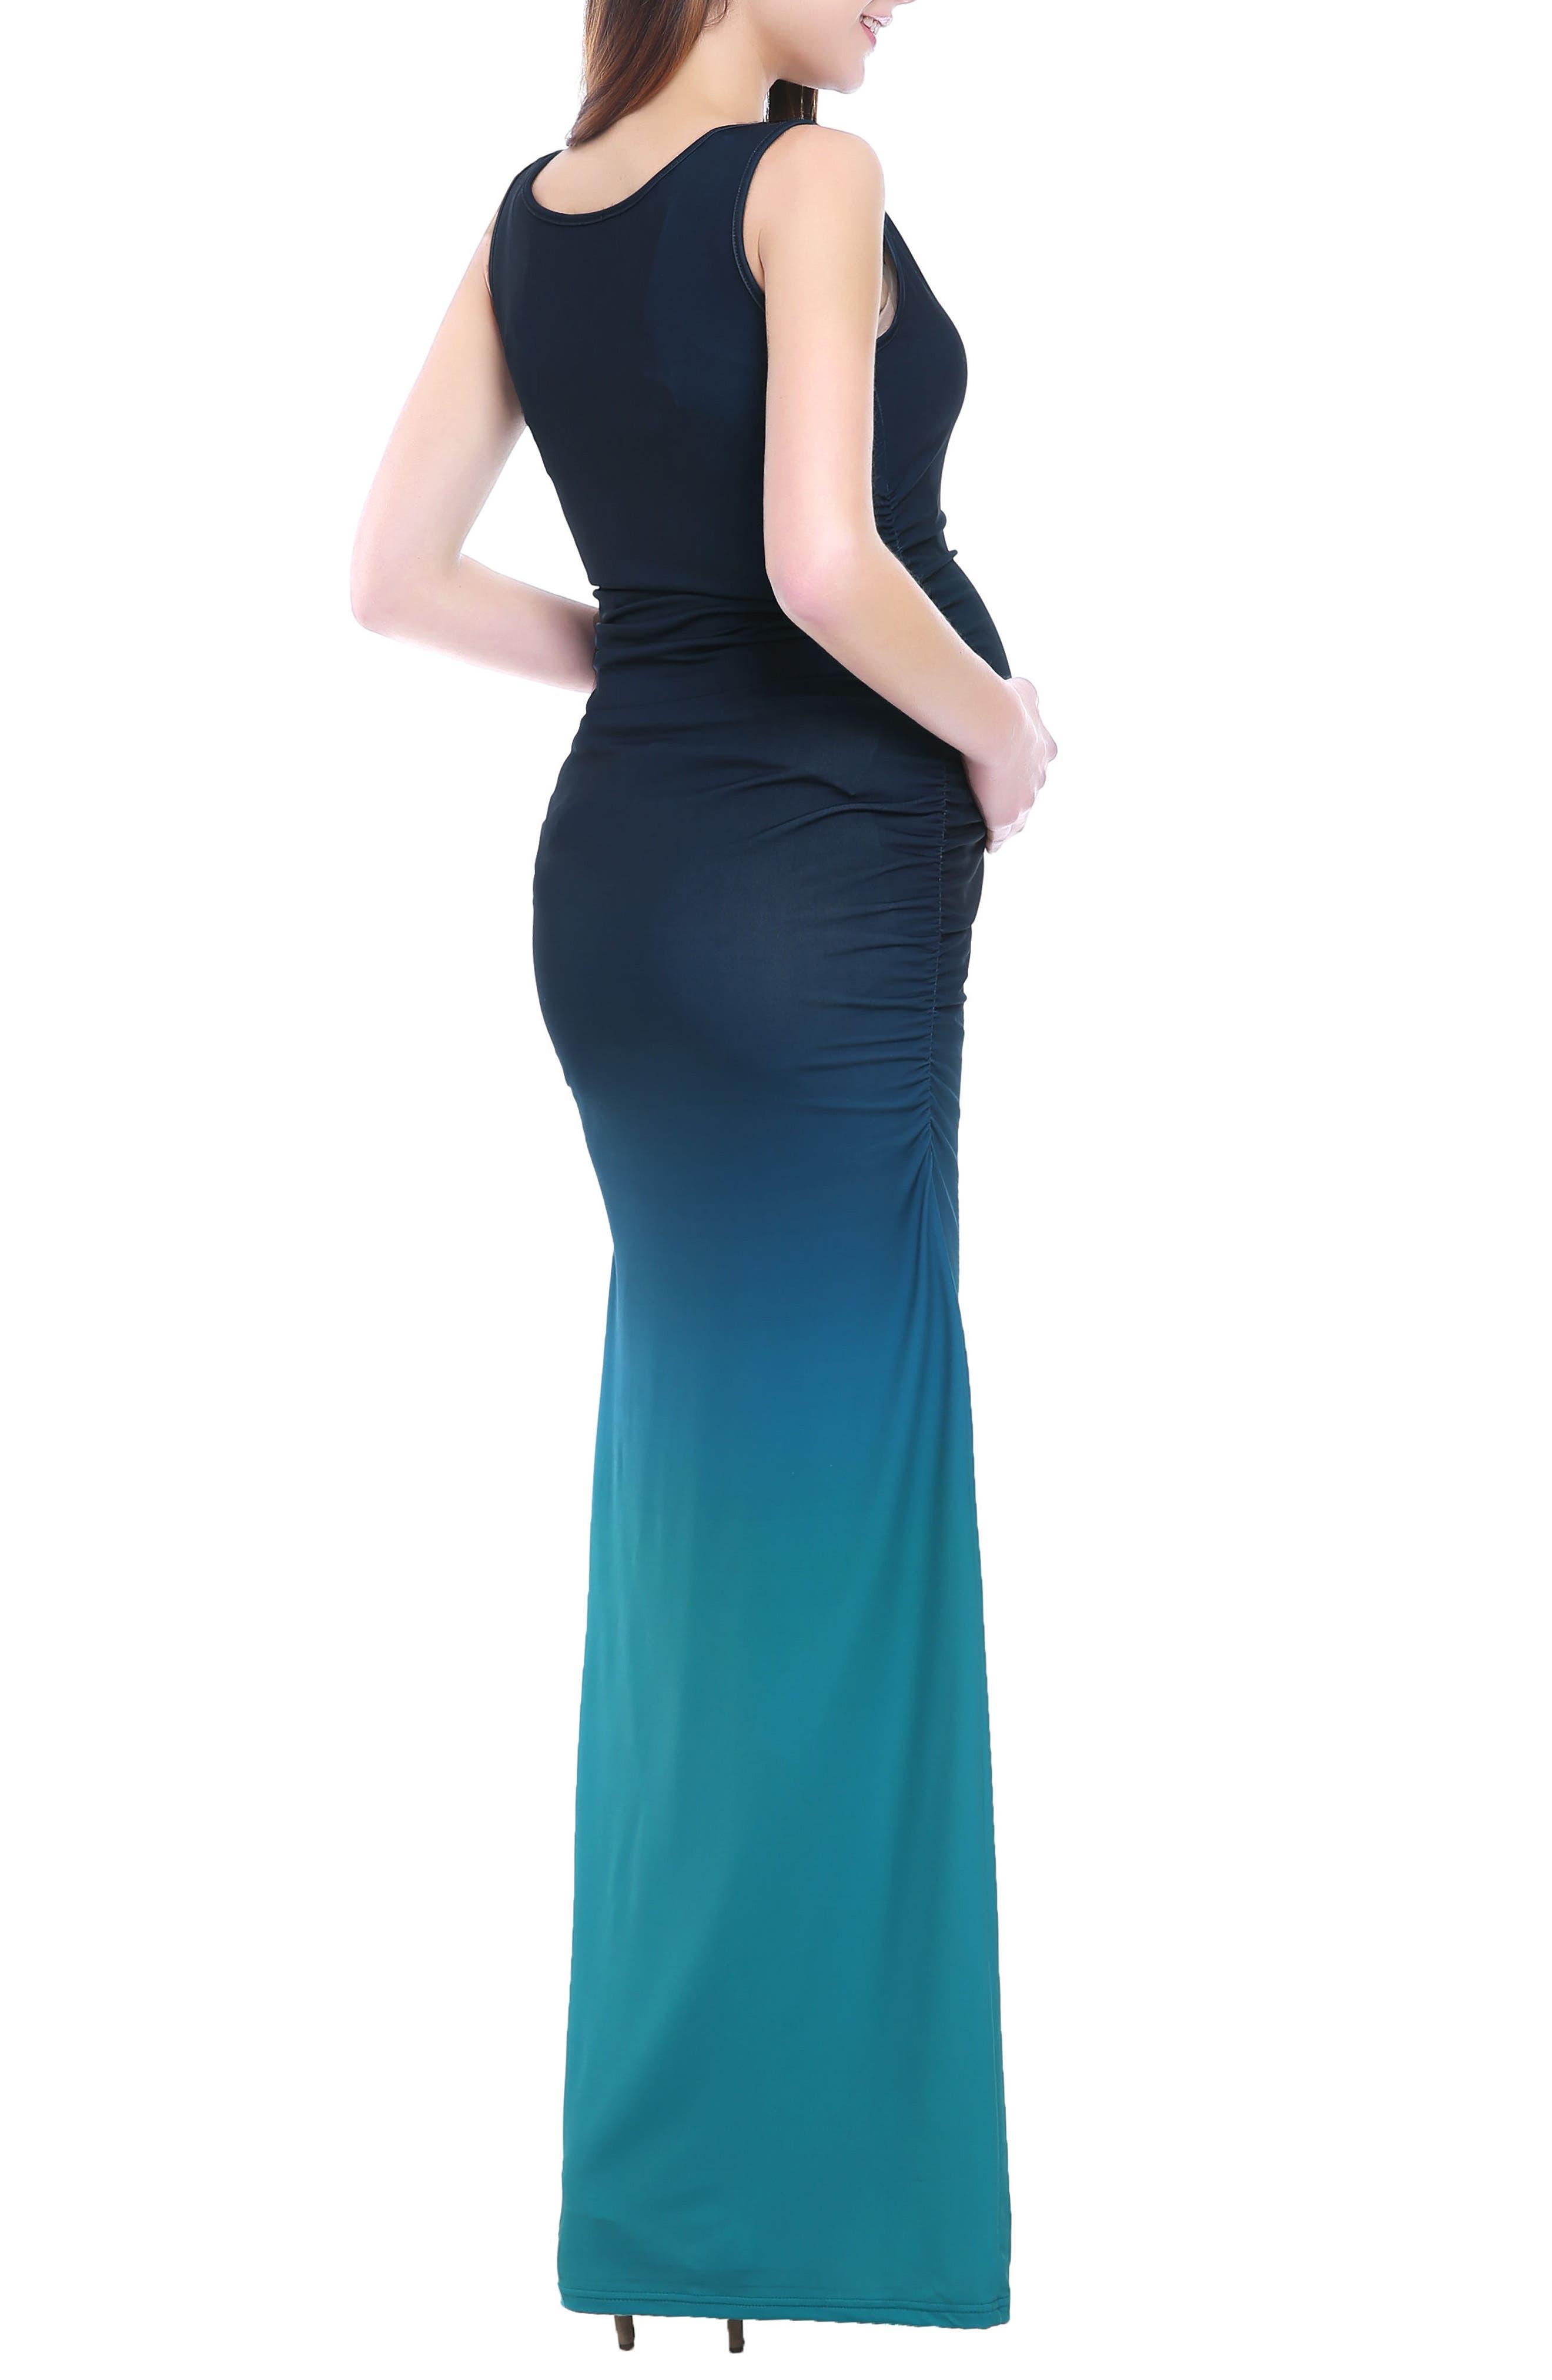 Sonia Ombré Maternity Maxi Dress,                             Alternate thumbnail 2, color,                             MULTICOLORED